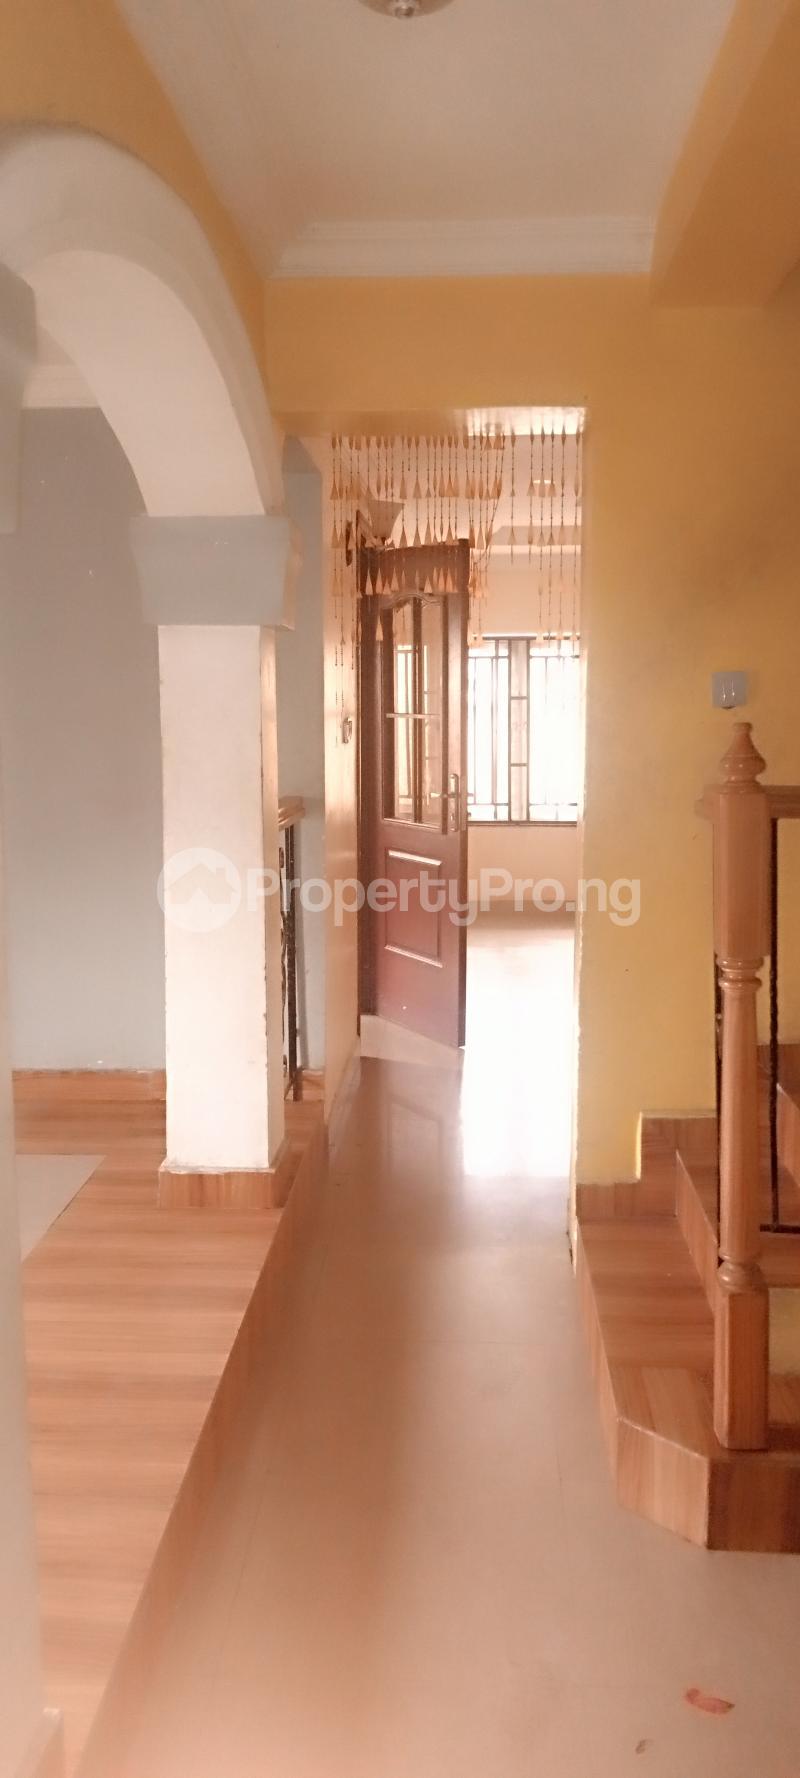 5 bedroom House for rent Estate drive Omole phase 2 Ojodu Lagos - 13